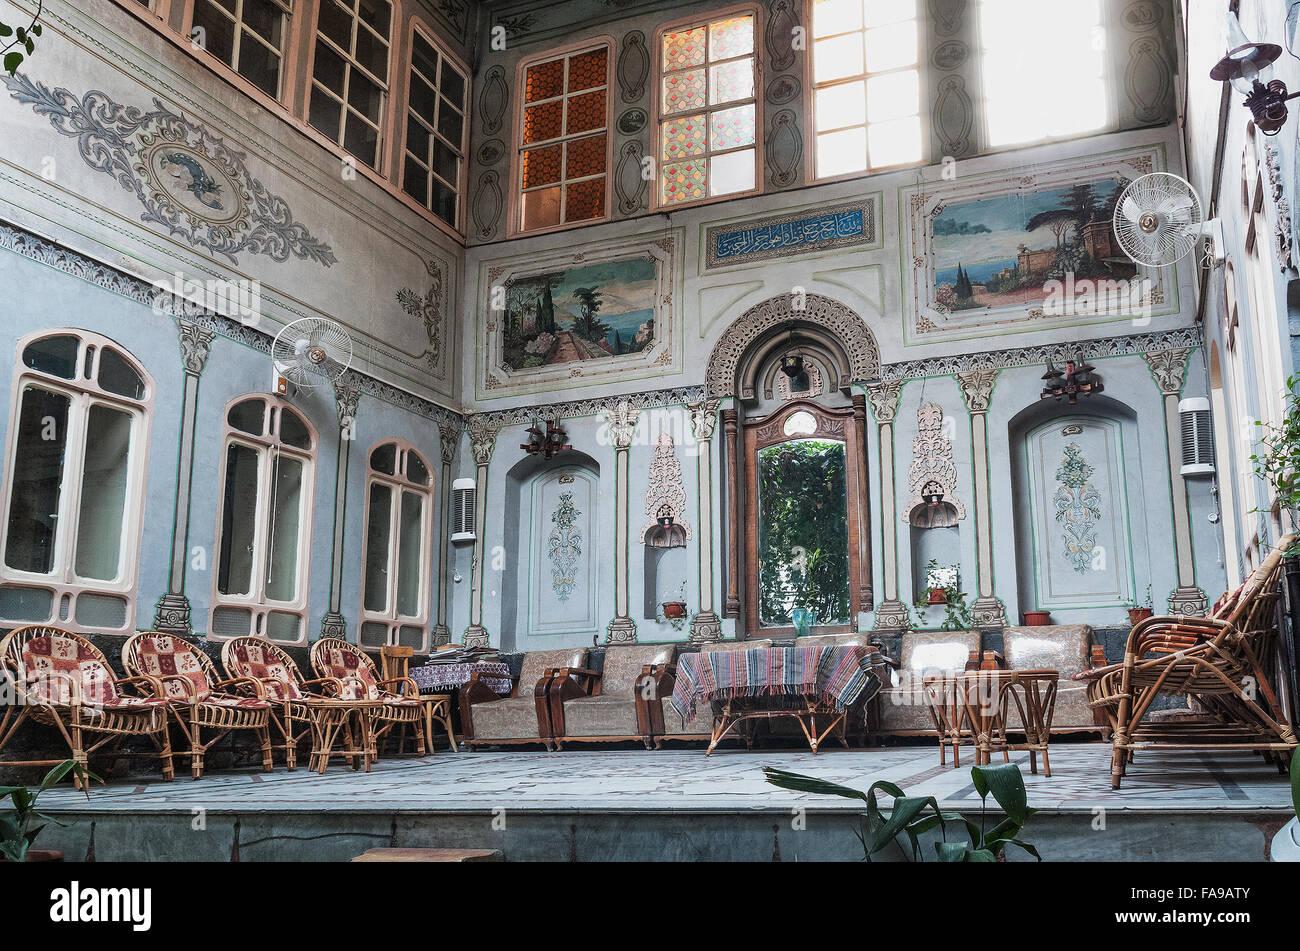 famous al rabie hotel lobby classic interior in damascus syria - Stock Image